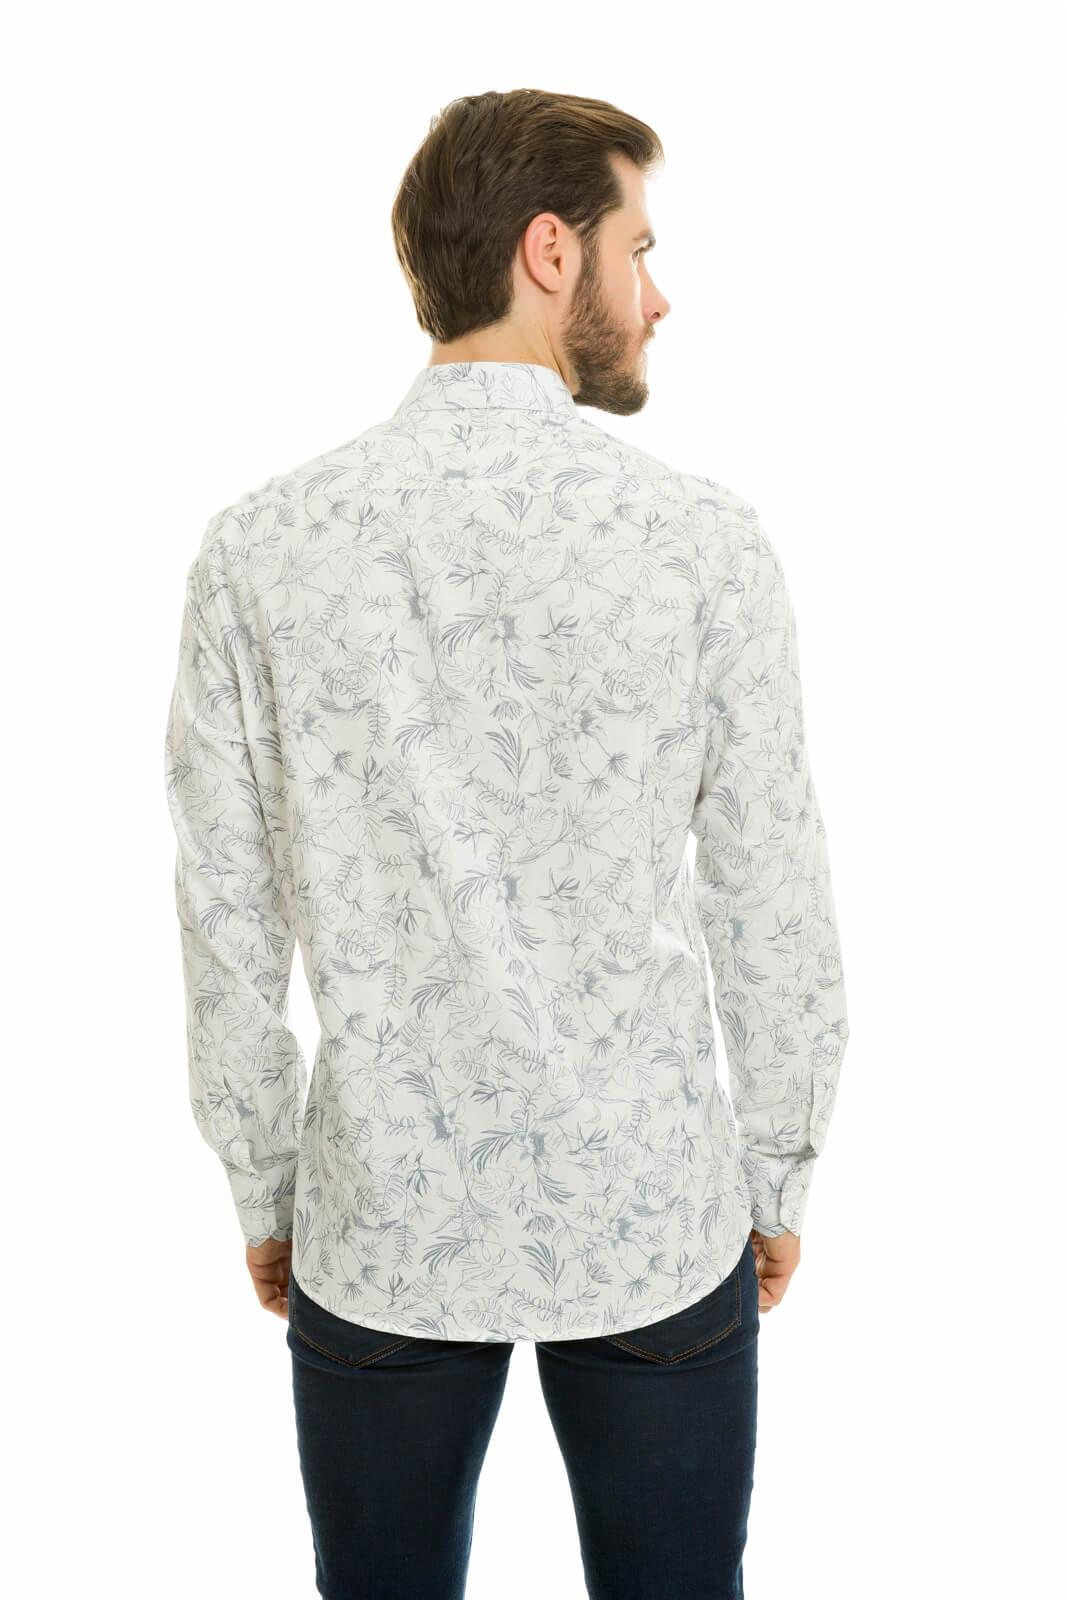 Camisa Social Masculina Slim Olimpo Floral Manga Longa Branca